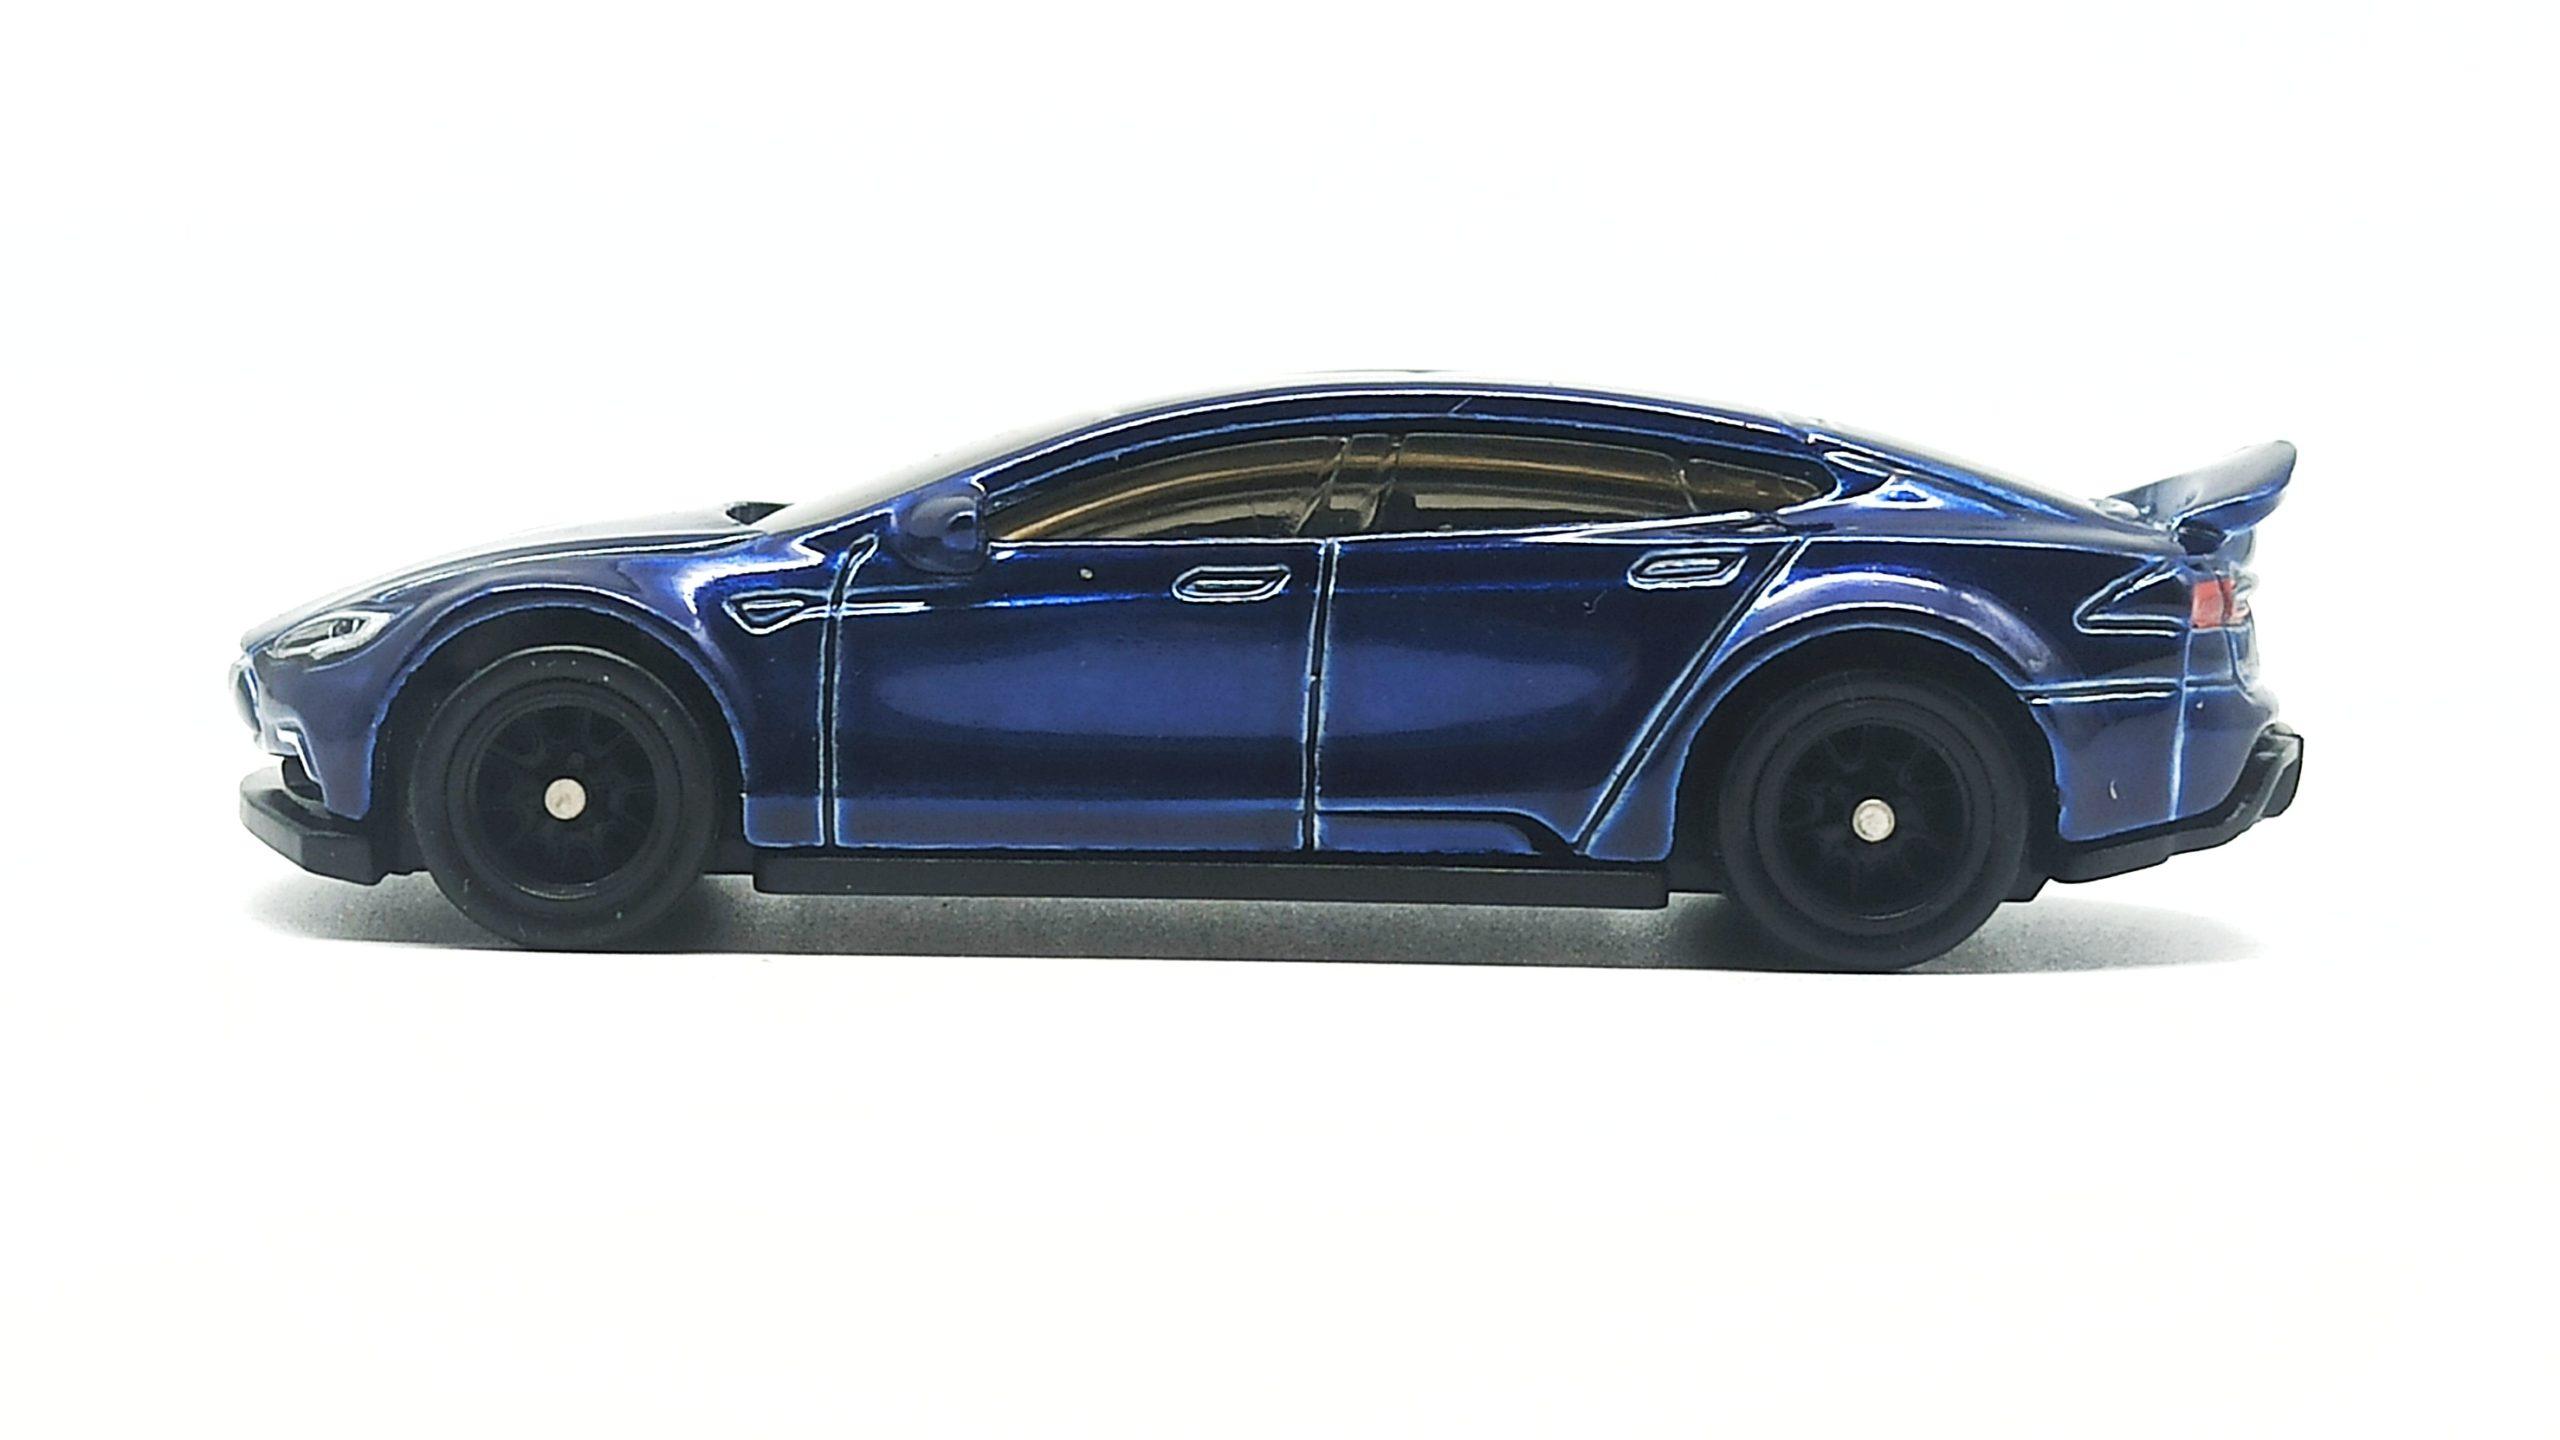 Hot Wheels Tesla Model S (FYG08) 2019 (226/250) HW Green Speed (4/5) indigo blue Super Treasure Hunt (STH) side